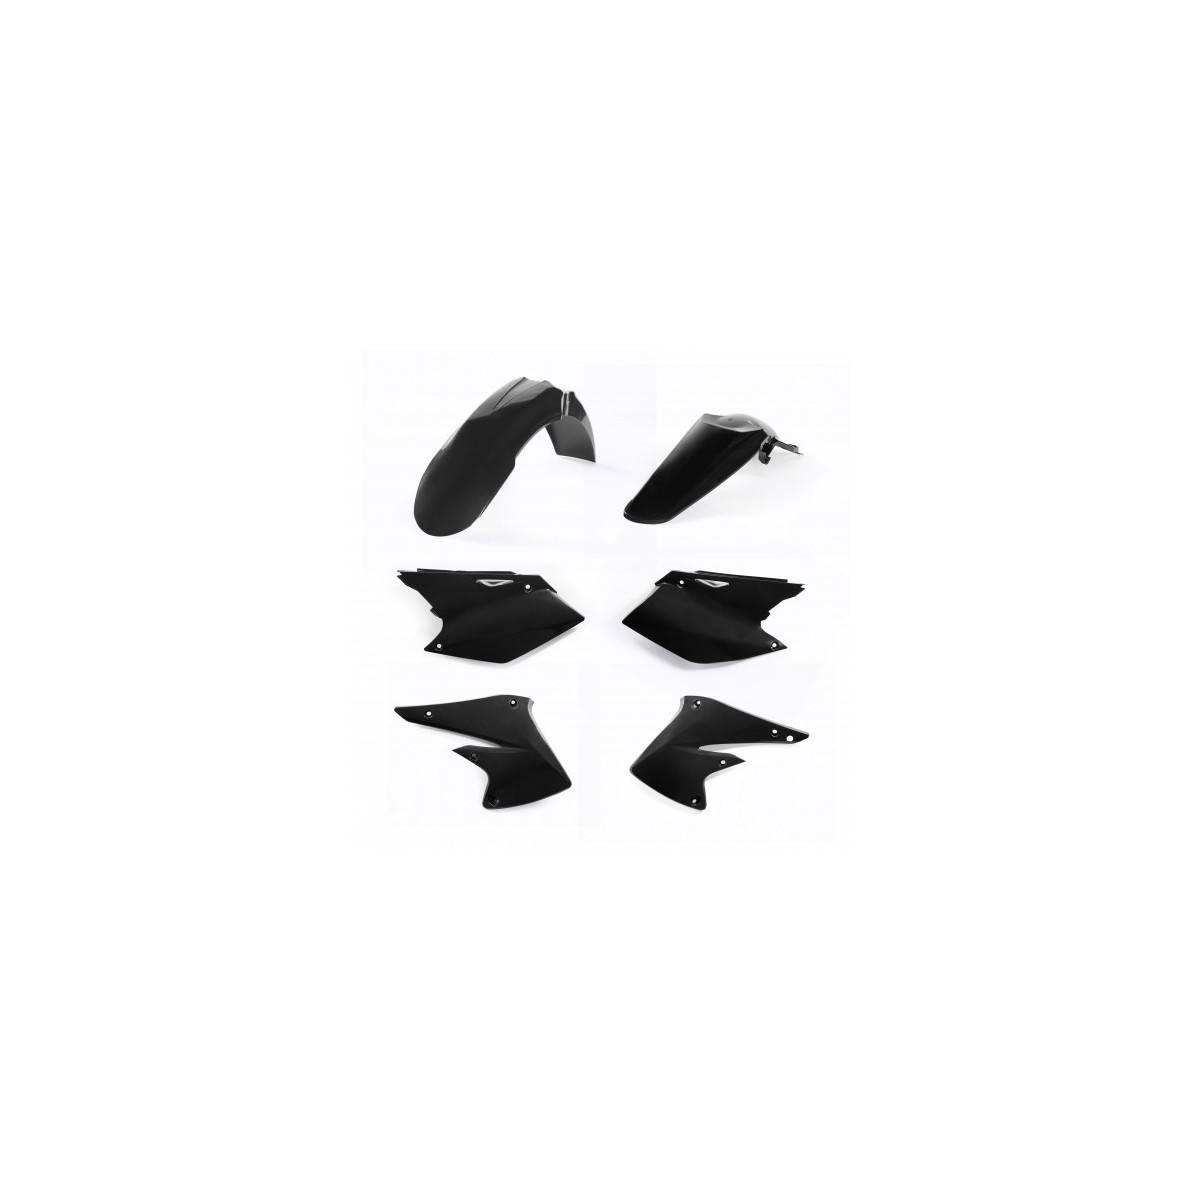 0023086-090 - Kit Plasticos Yz 250 Wr 250 18 Negro